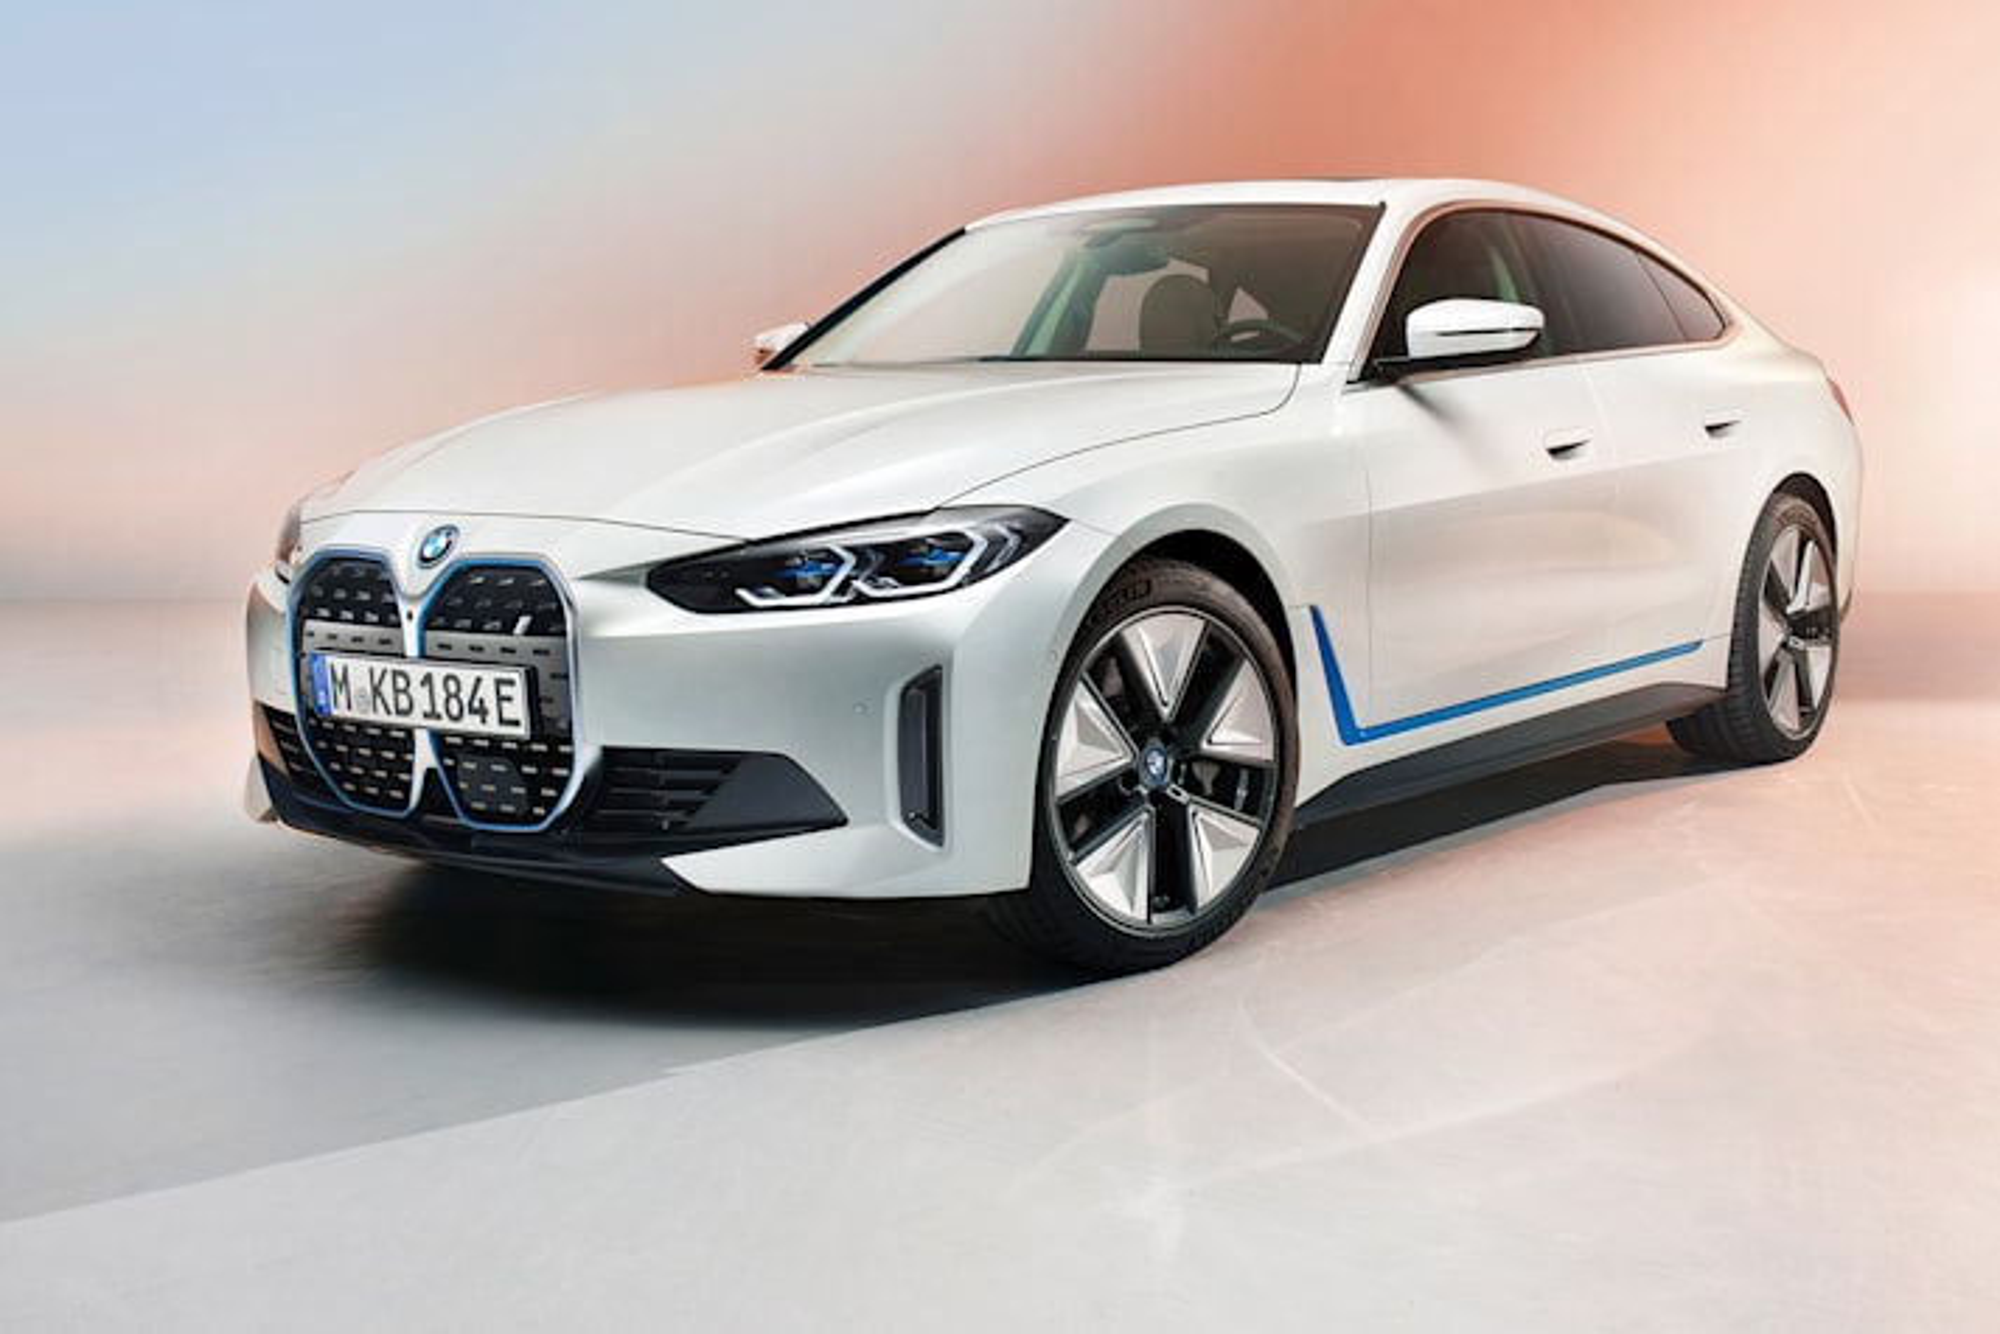 2022 Bmw I 4 Electric Car Revealed 1 1 Jpeg